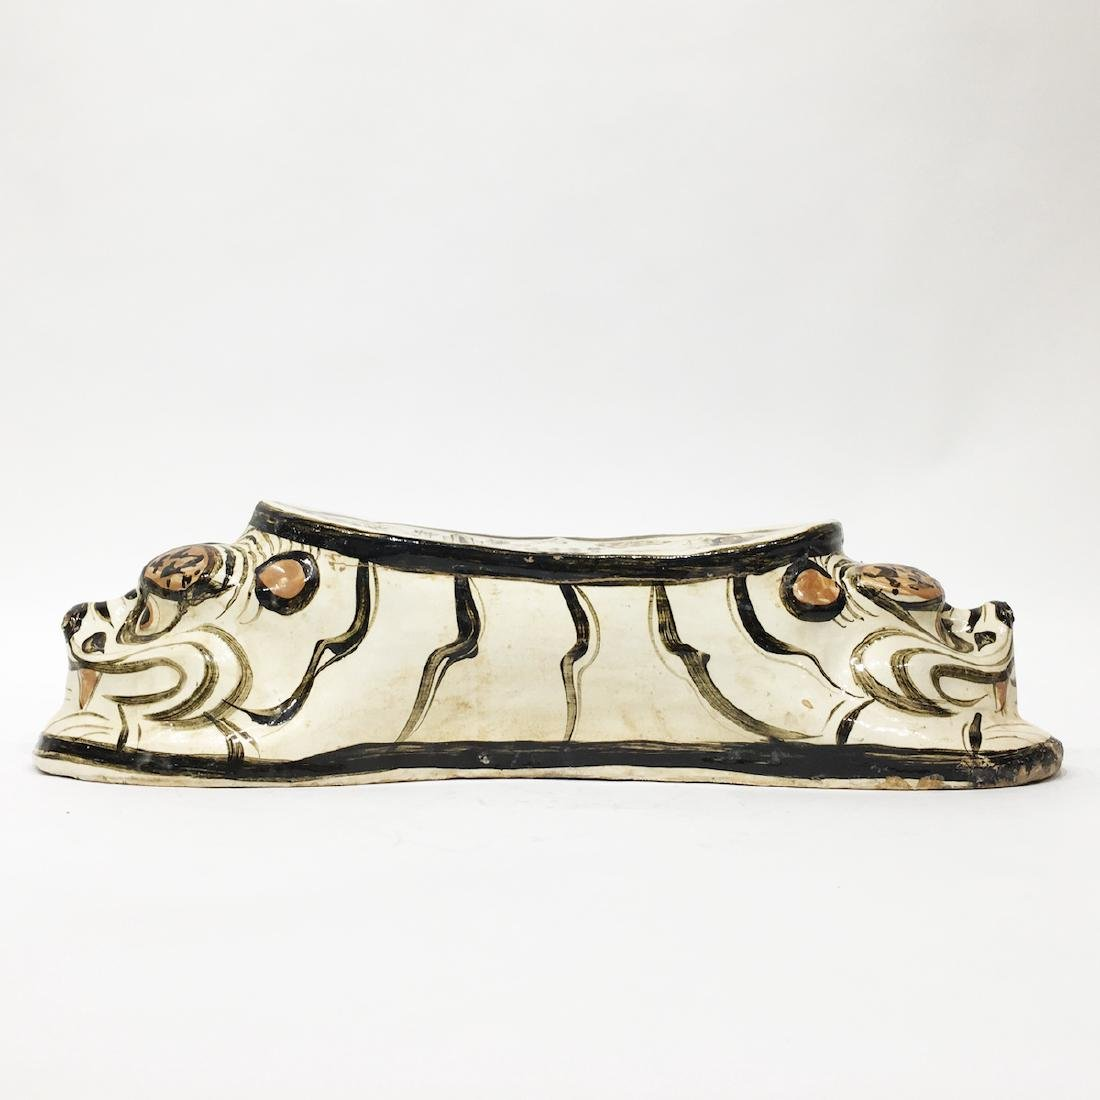 A Chinese Chi-chou Ceramic Pillow - 2